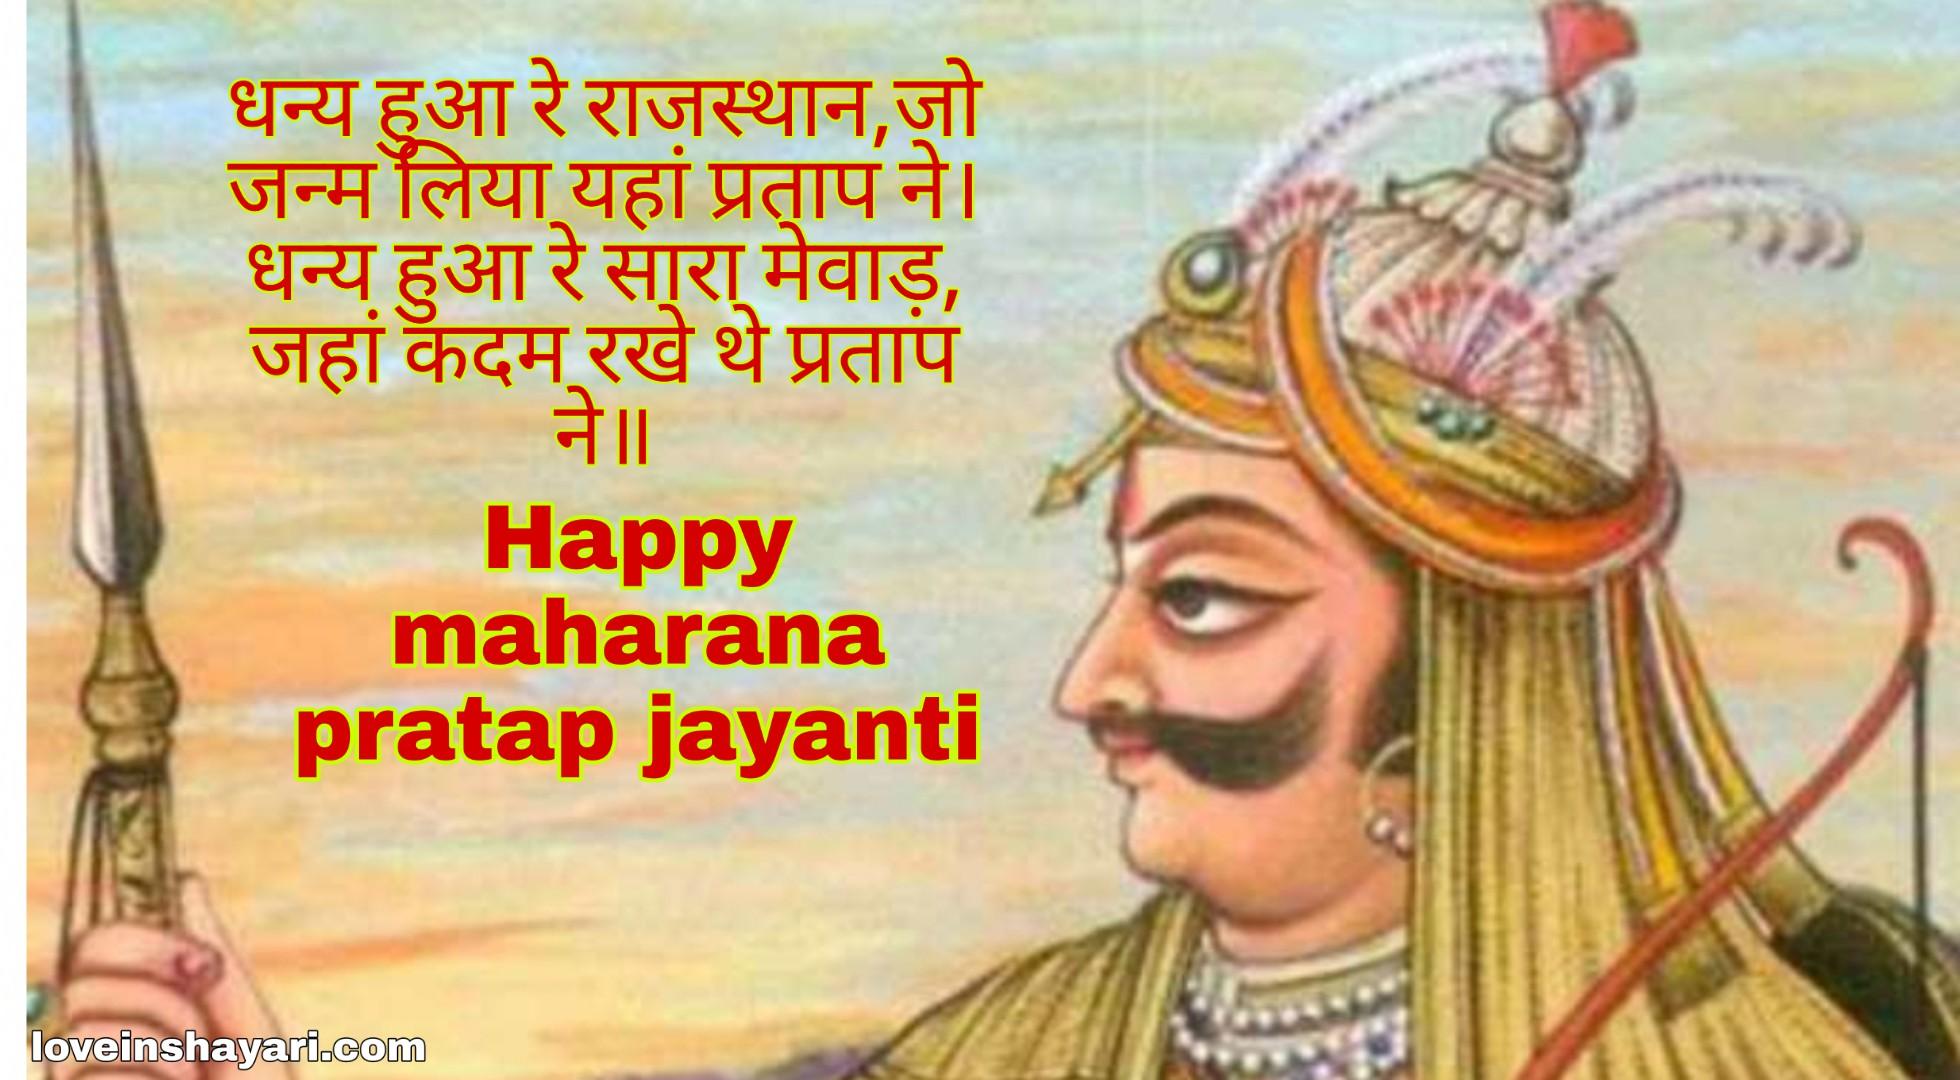 Maharana Pratap jayanti shayari wishes quotes sms